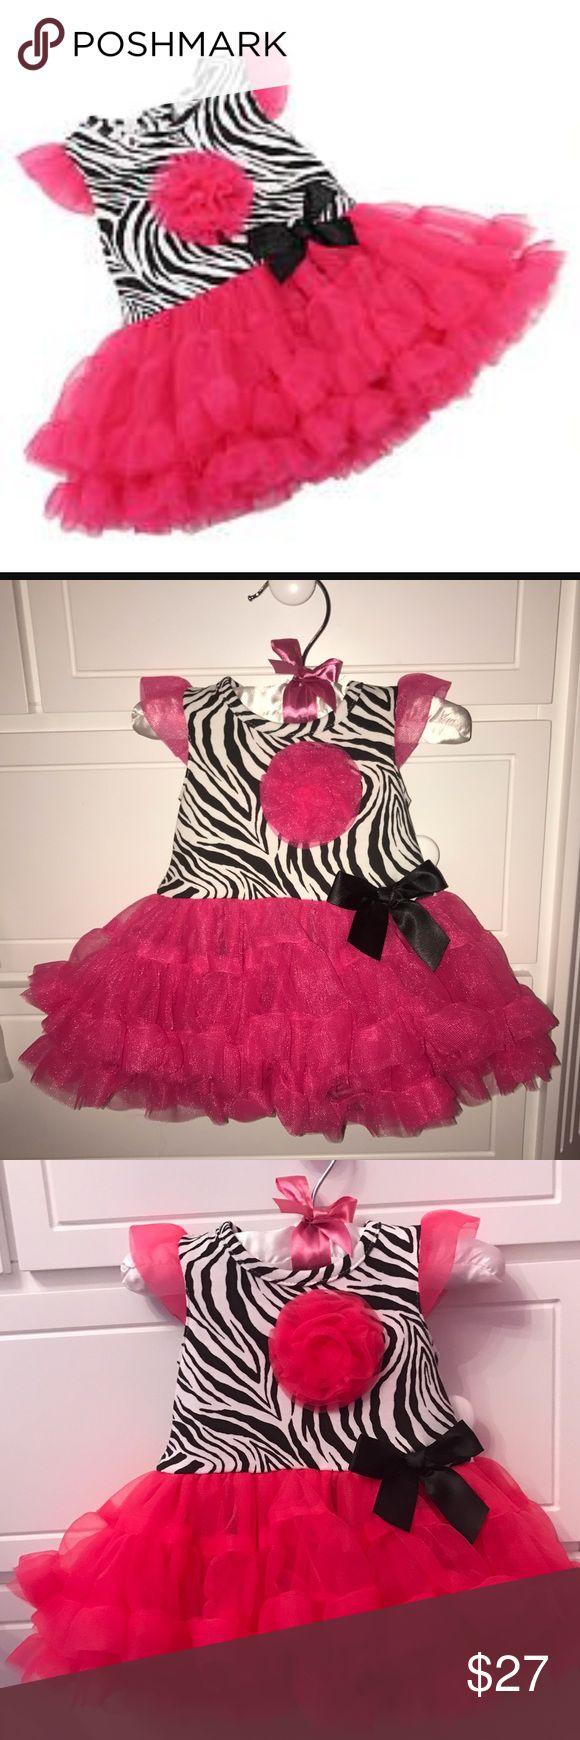 High end Zebra Print Pink Tutu Bodysuit Dress NWT Babyrageous Girls Black/White Zebra Print Pink Tutu Bodysuit Dress. Snap closure In back and on bottom of onesie. Size NB. Exclusive for Babys R us. Babyrageous Boutique One Pieces Bodysuits